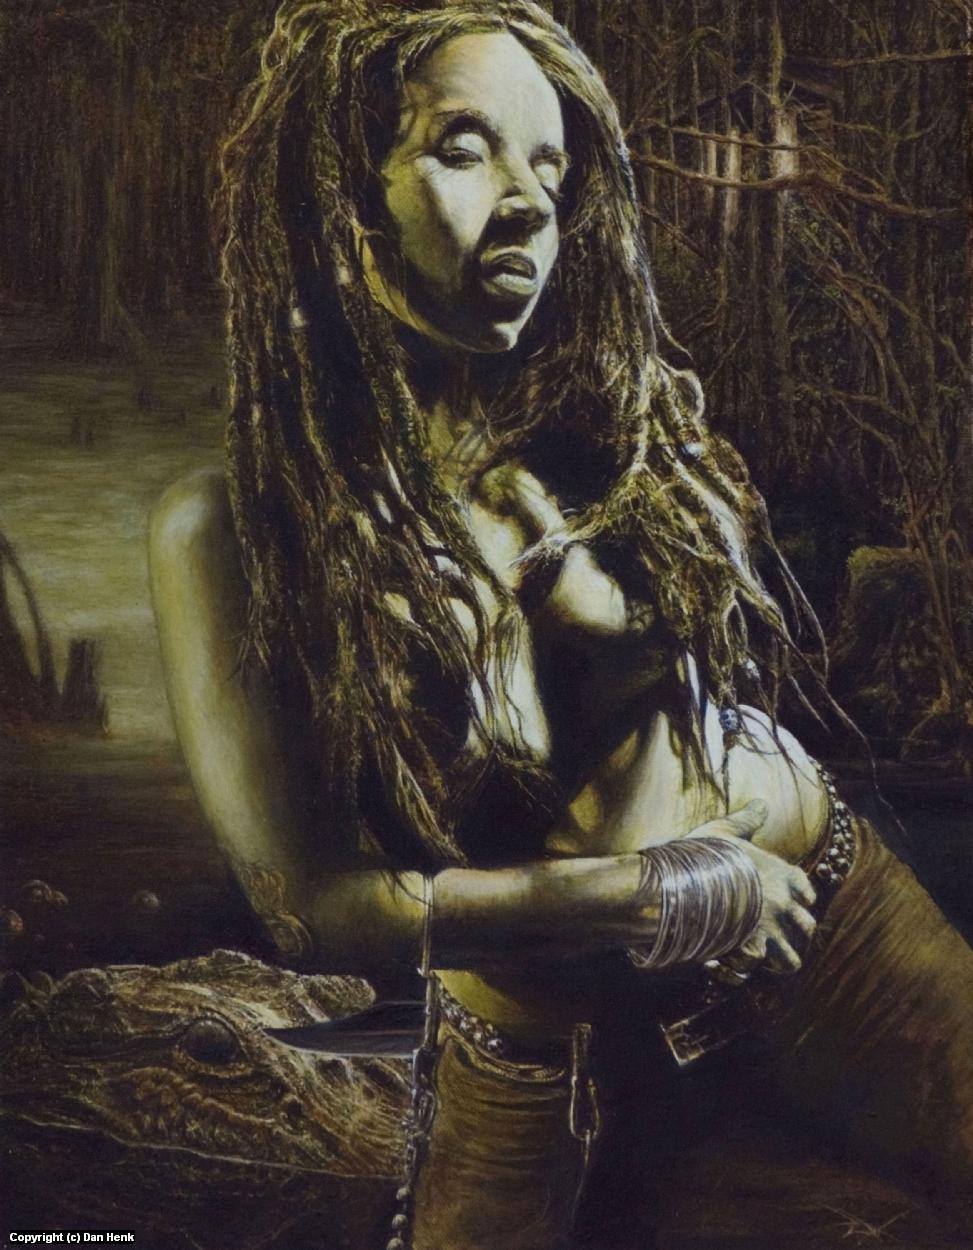 Nighfall on the Bayou Artwork by Dan Henk